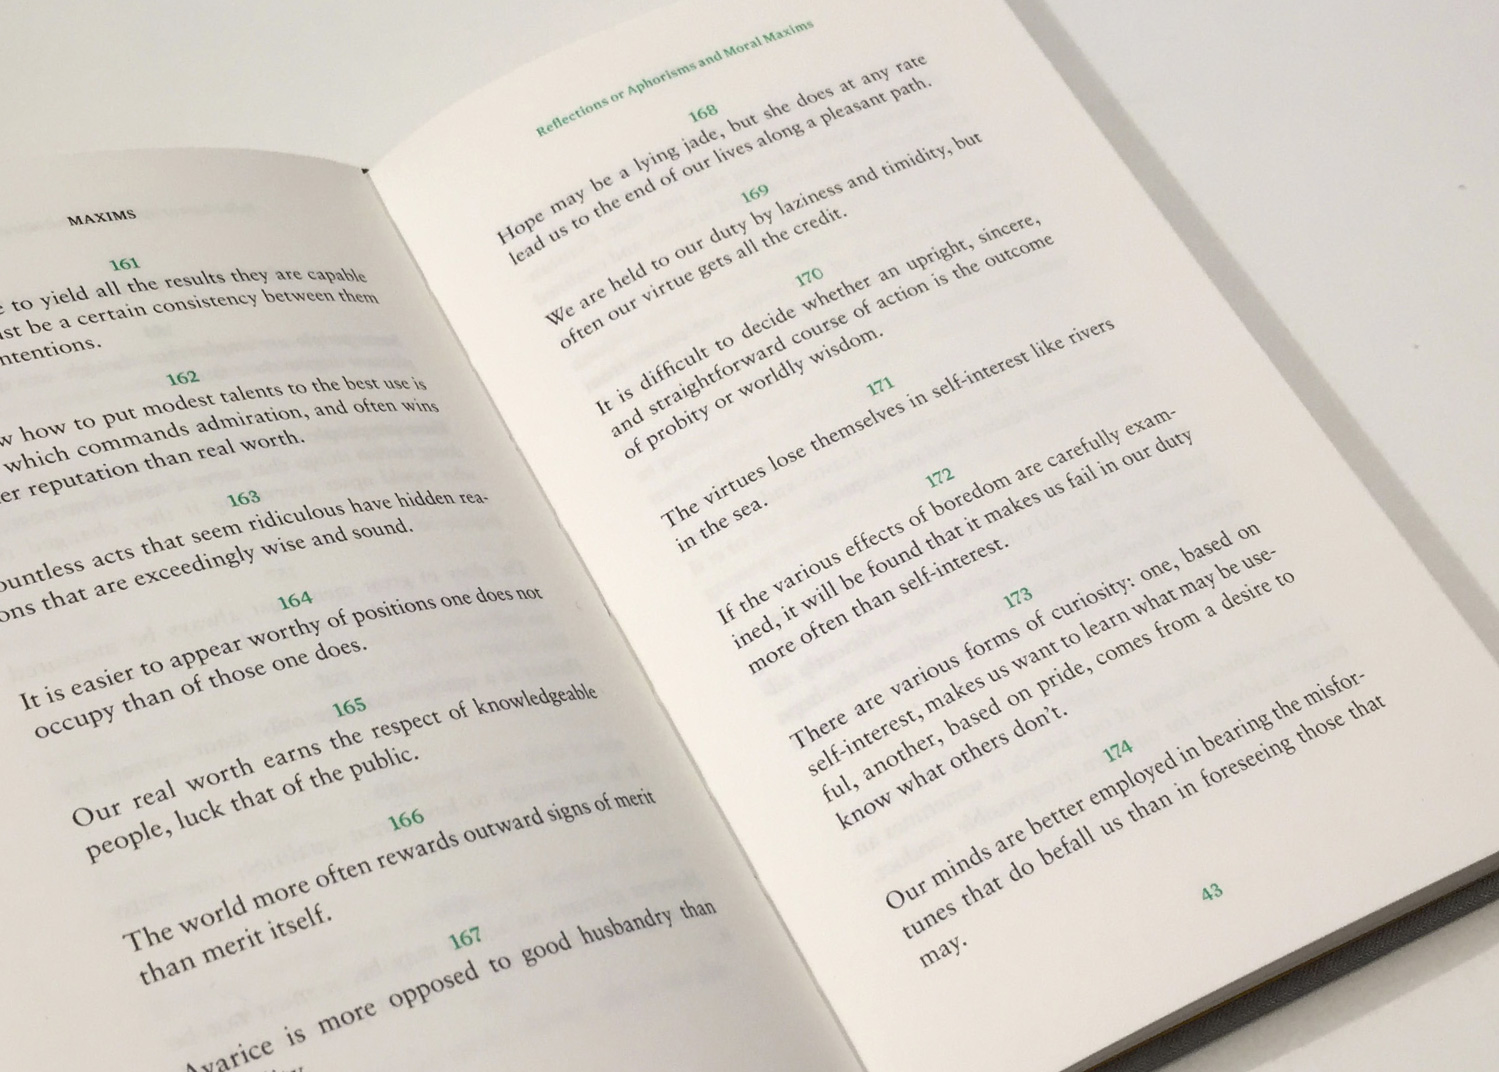 TSOL_books_inside4_1500